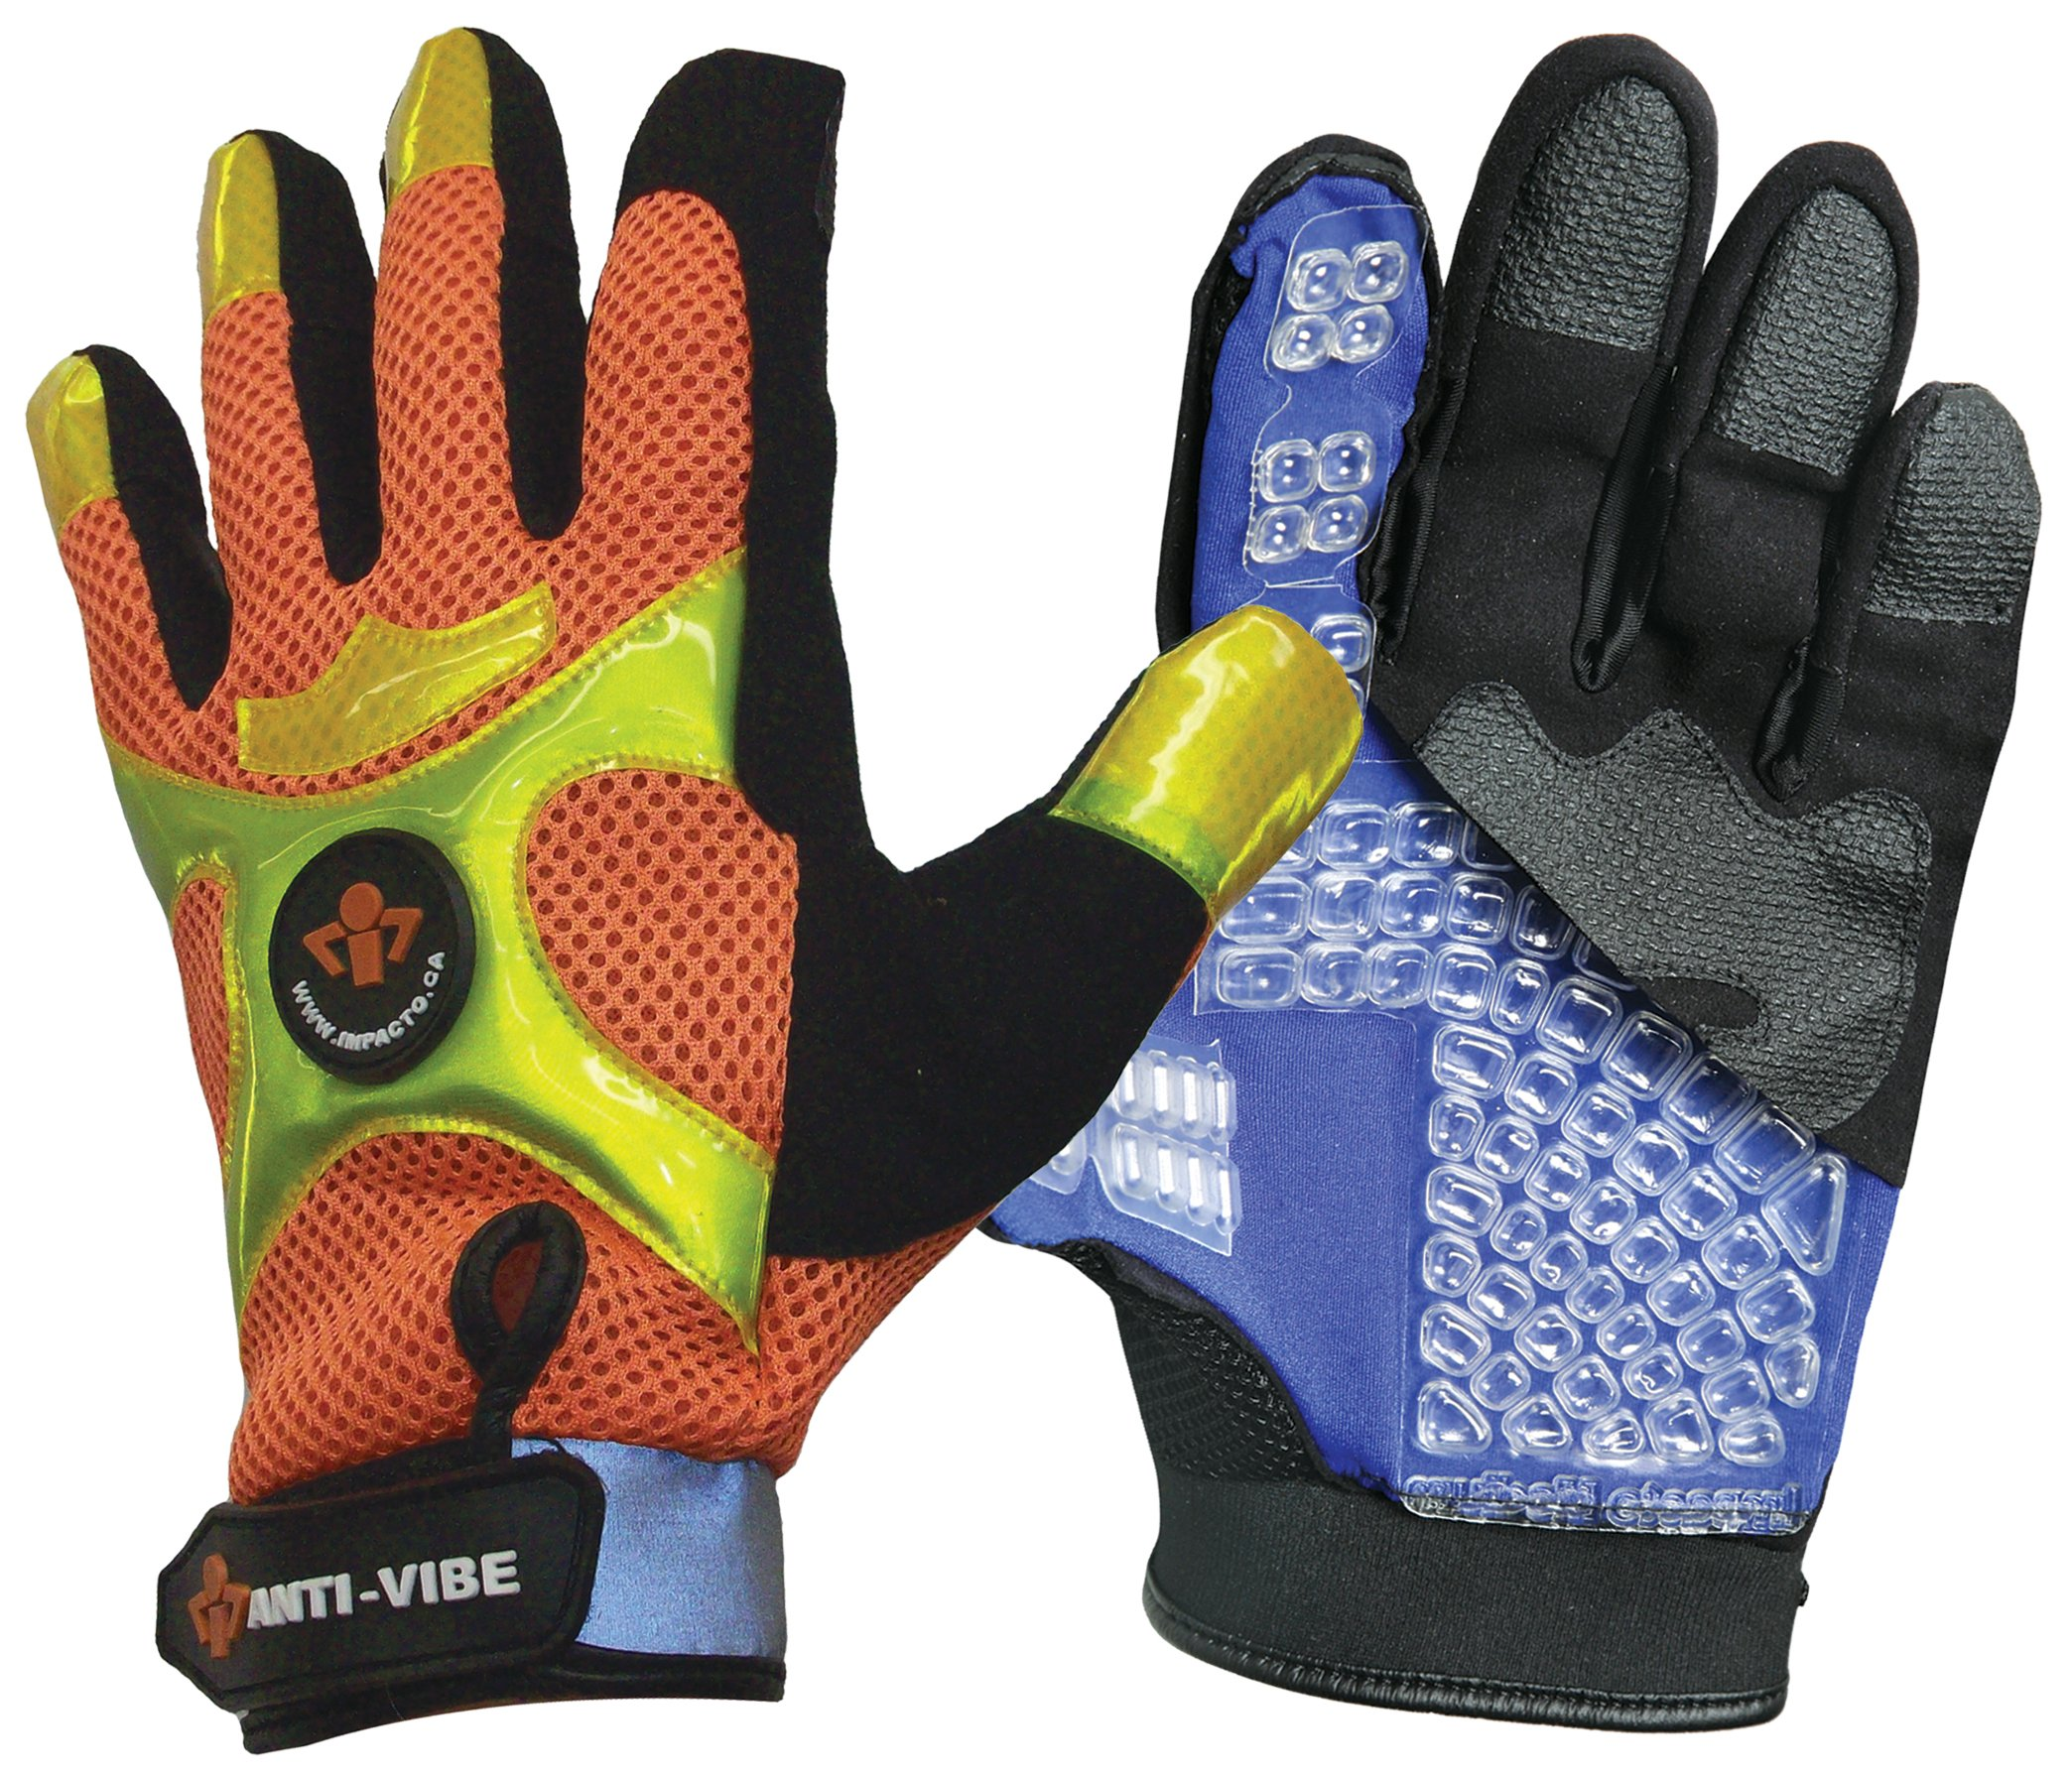 Impacto BGHIVIS40 Anti-Vibration High Visibility Mechanic's Air Glove, Orange/Black